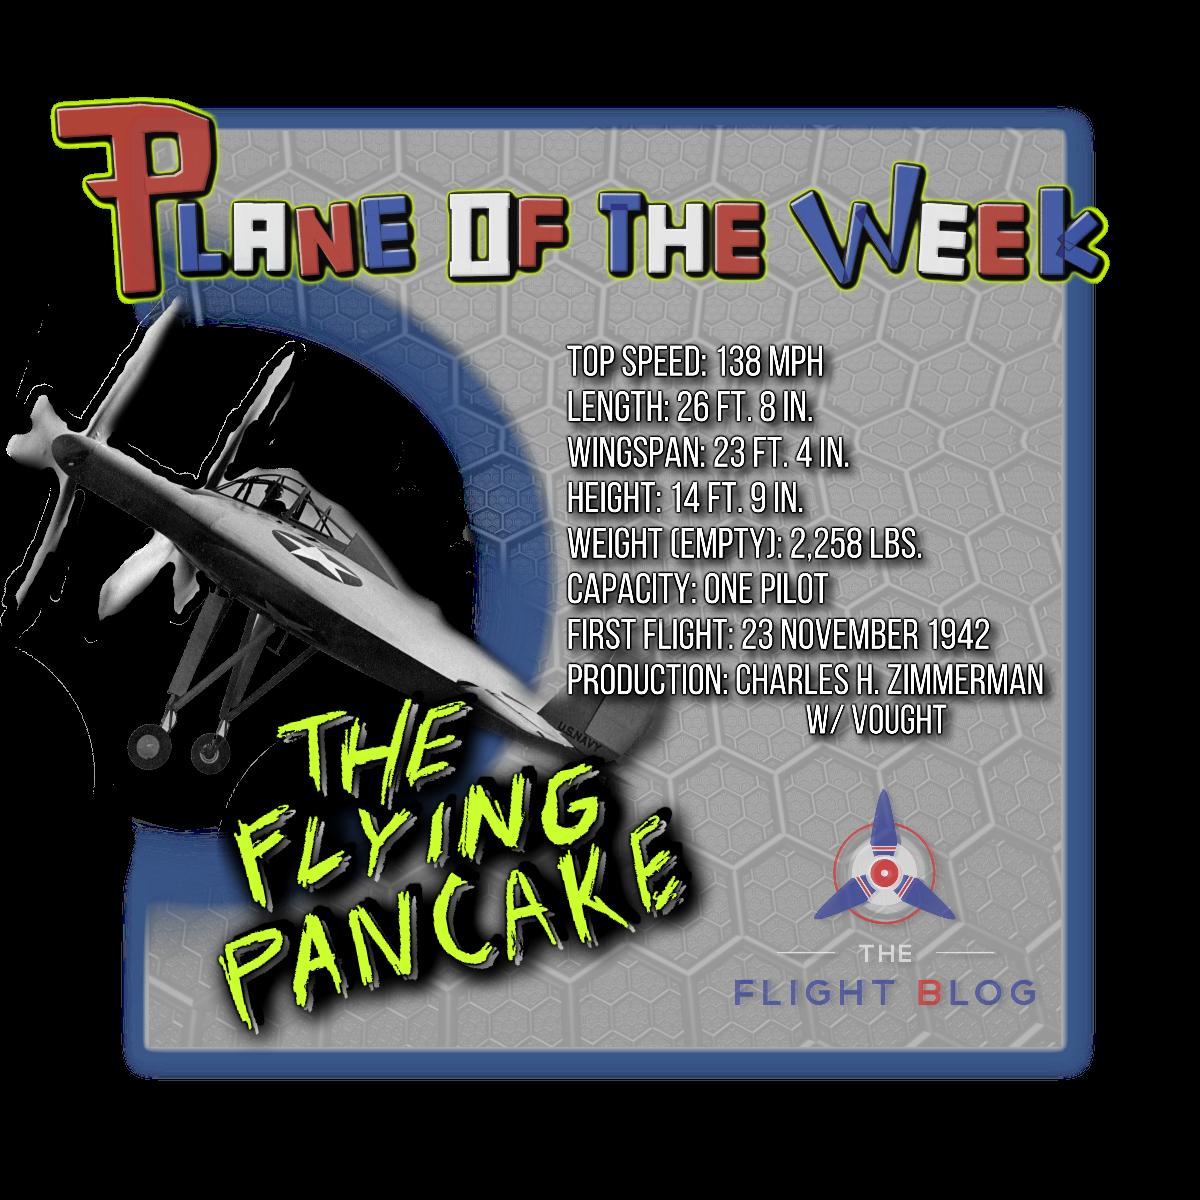 V-173, flying pancake, the flight blog, plane of the week